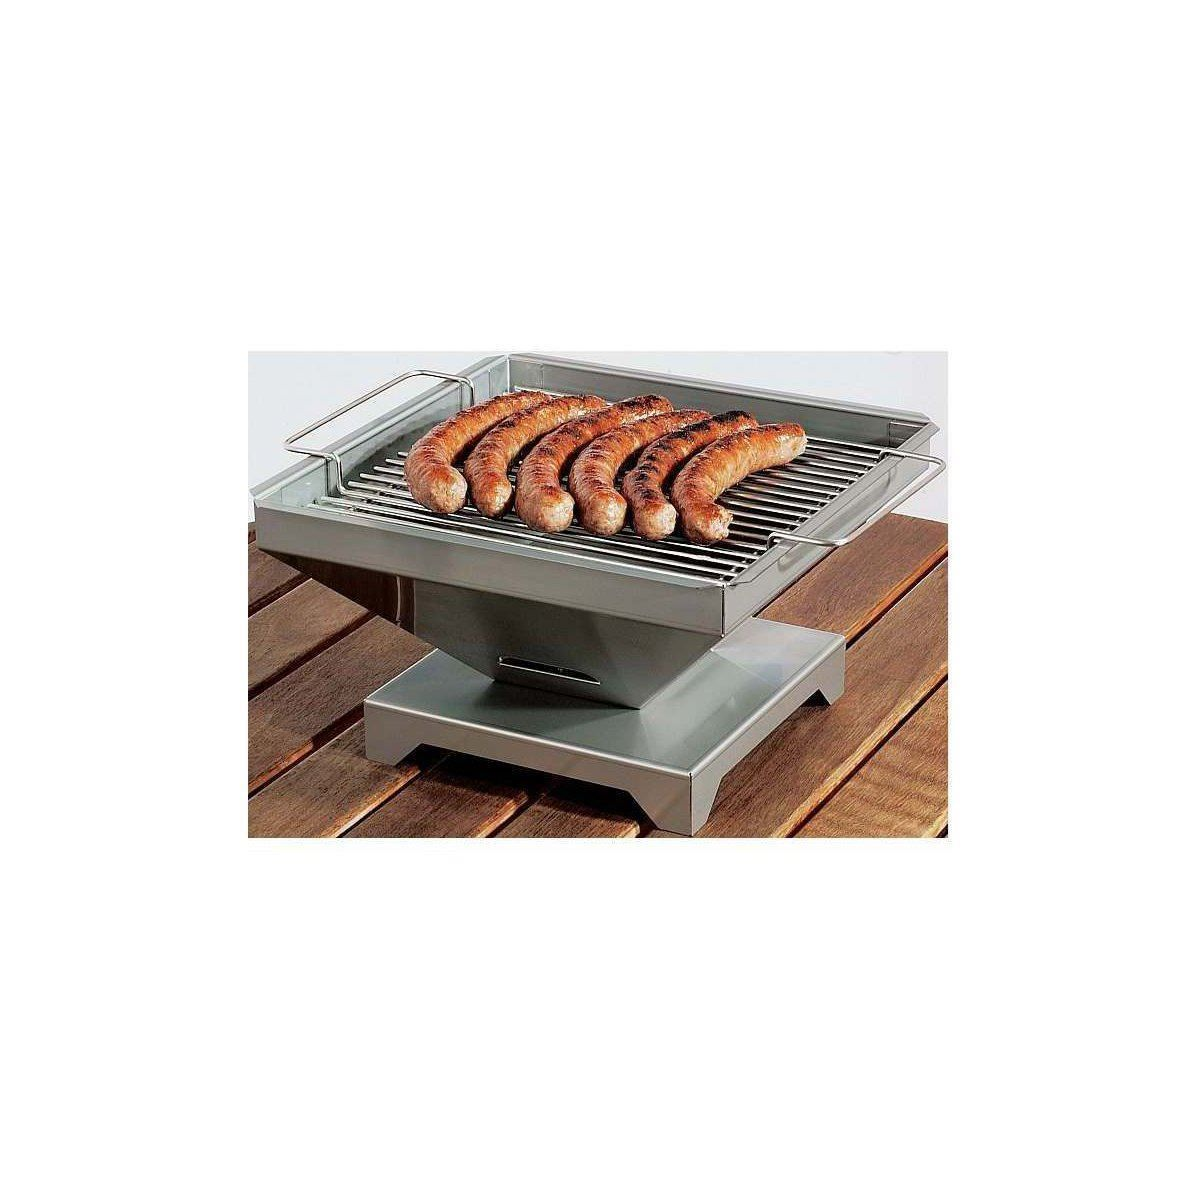 thueros t1 edelstahl tischgrill 30x30cm | barbecue season | barbecue